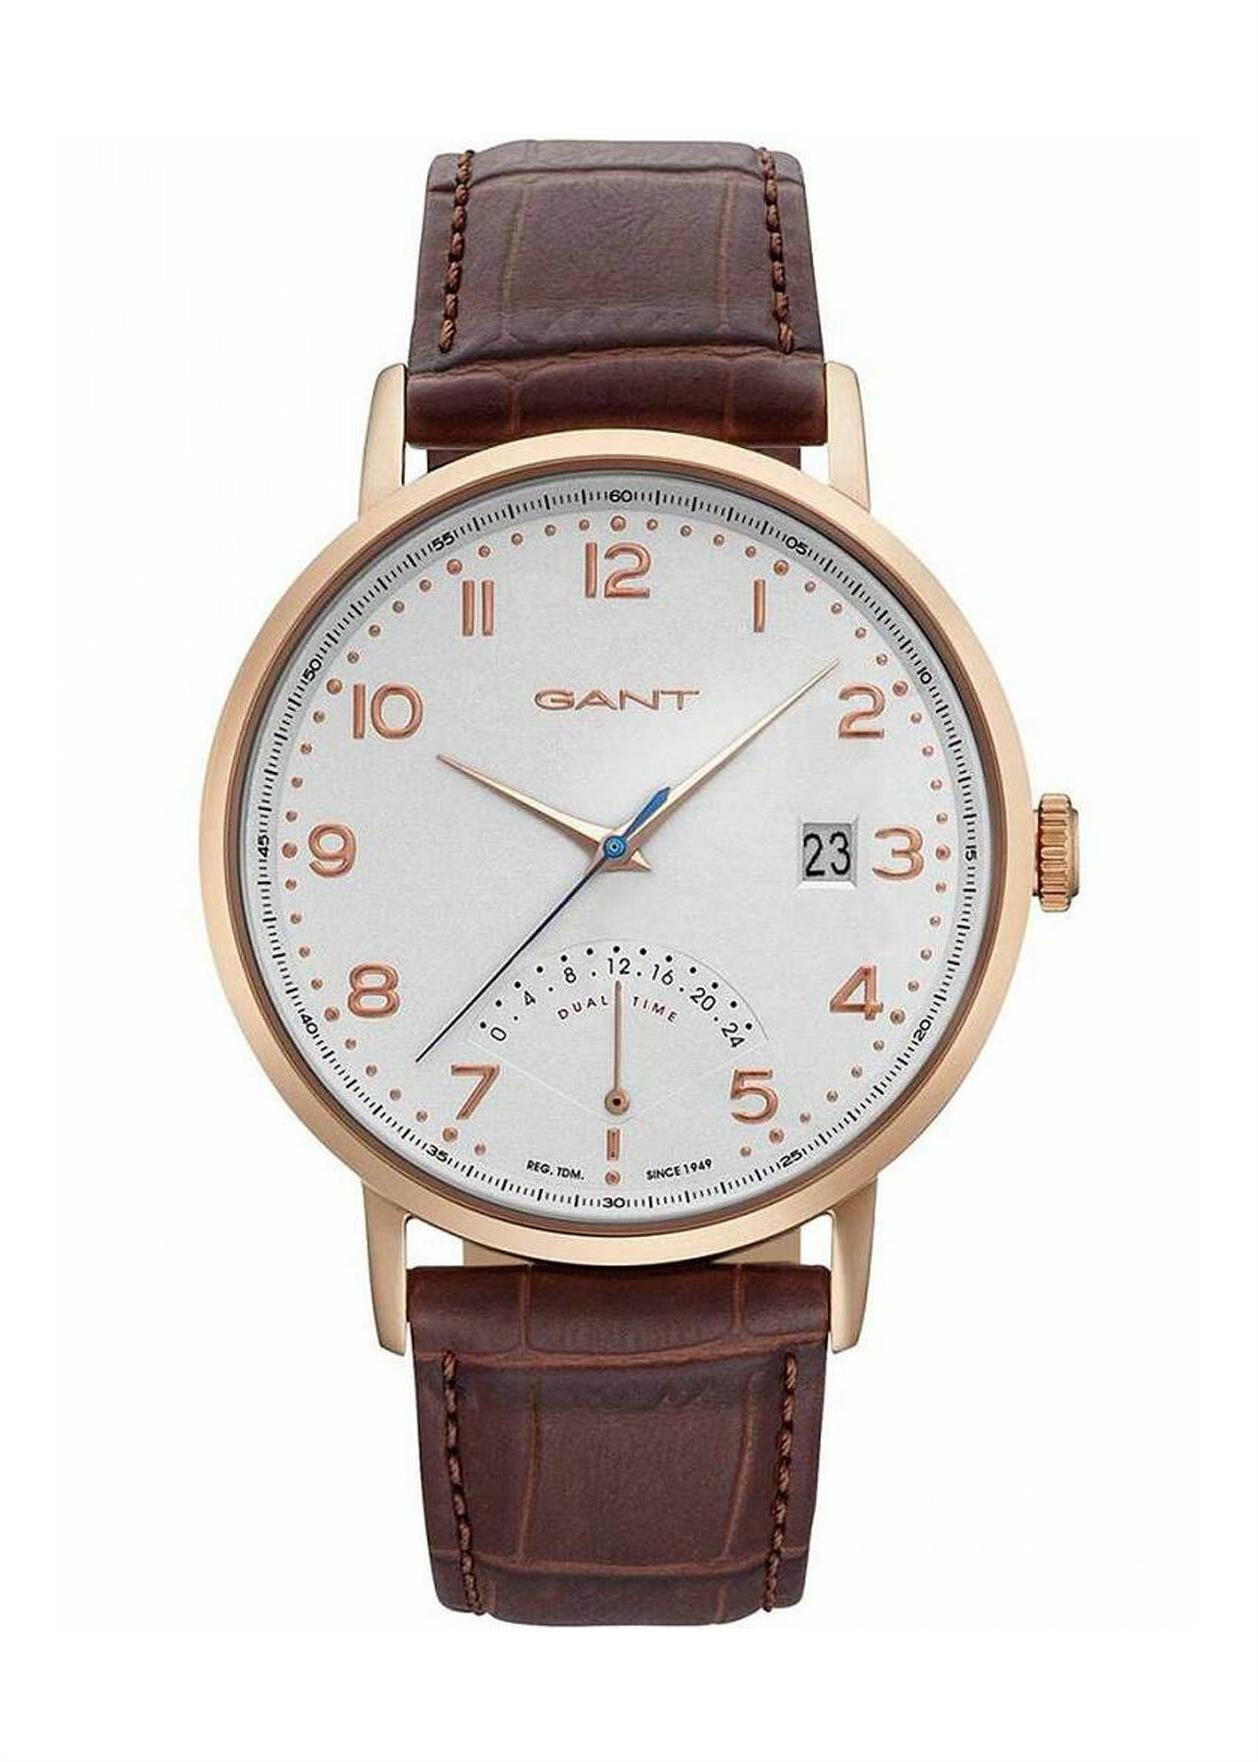 GANT Mens Wrist Watch Model Pennington GT022003